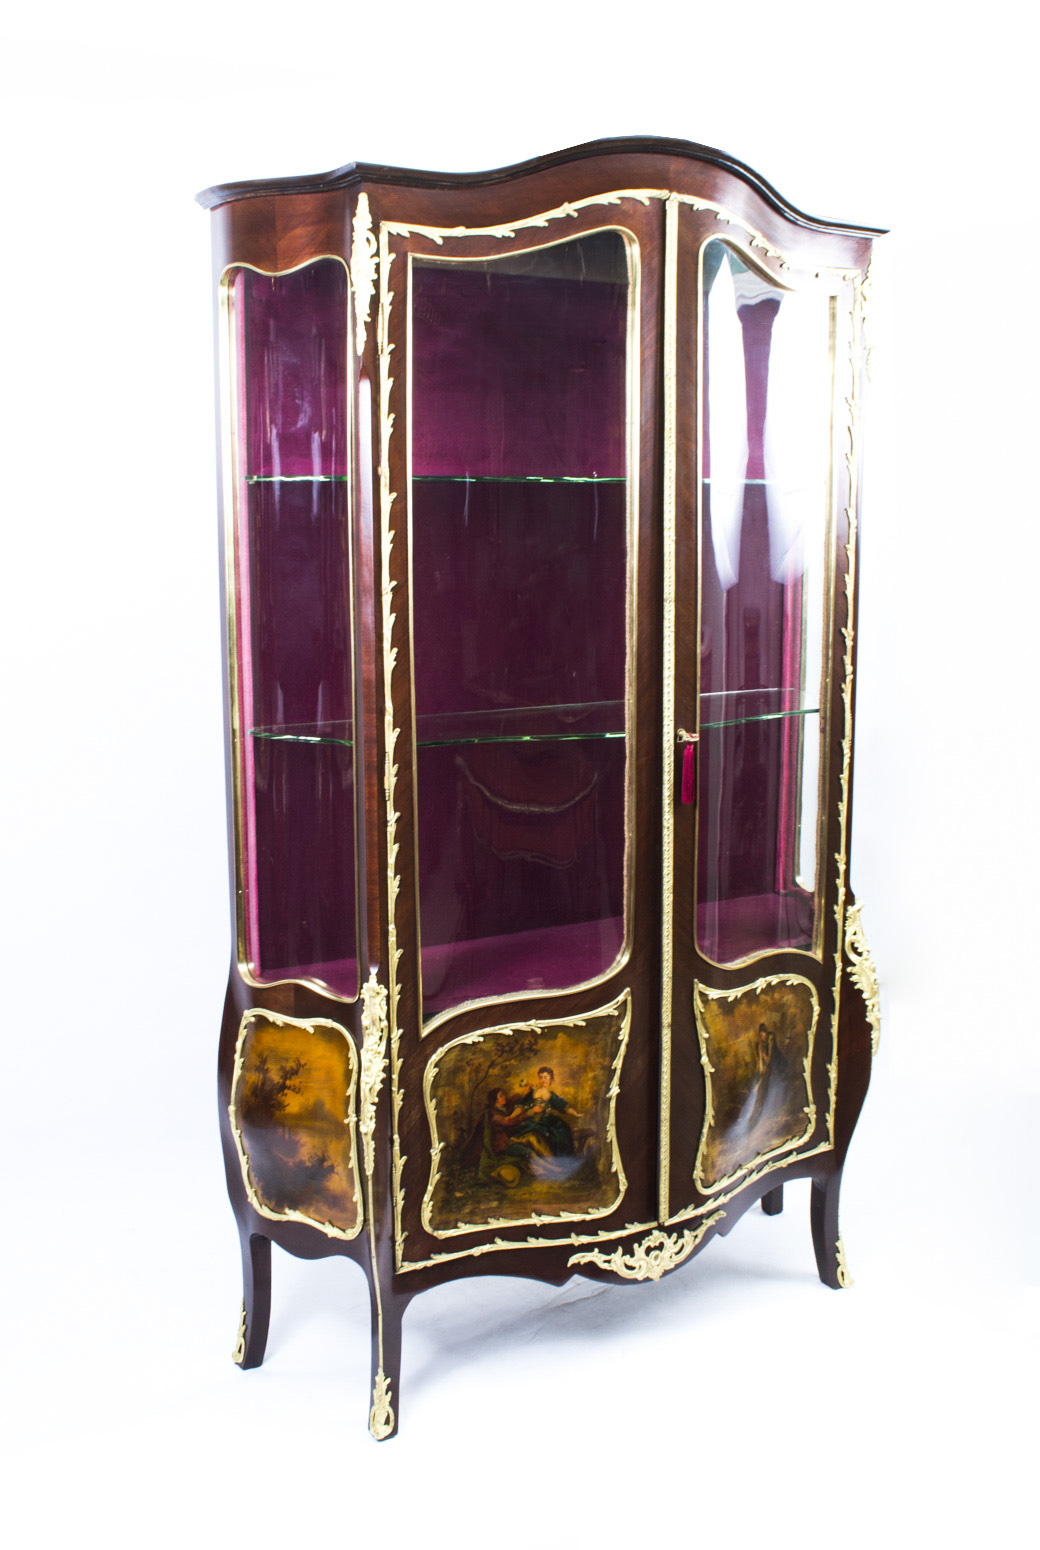 Antique French Kingwood Ref No 07112 Regent Antiques